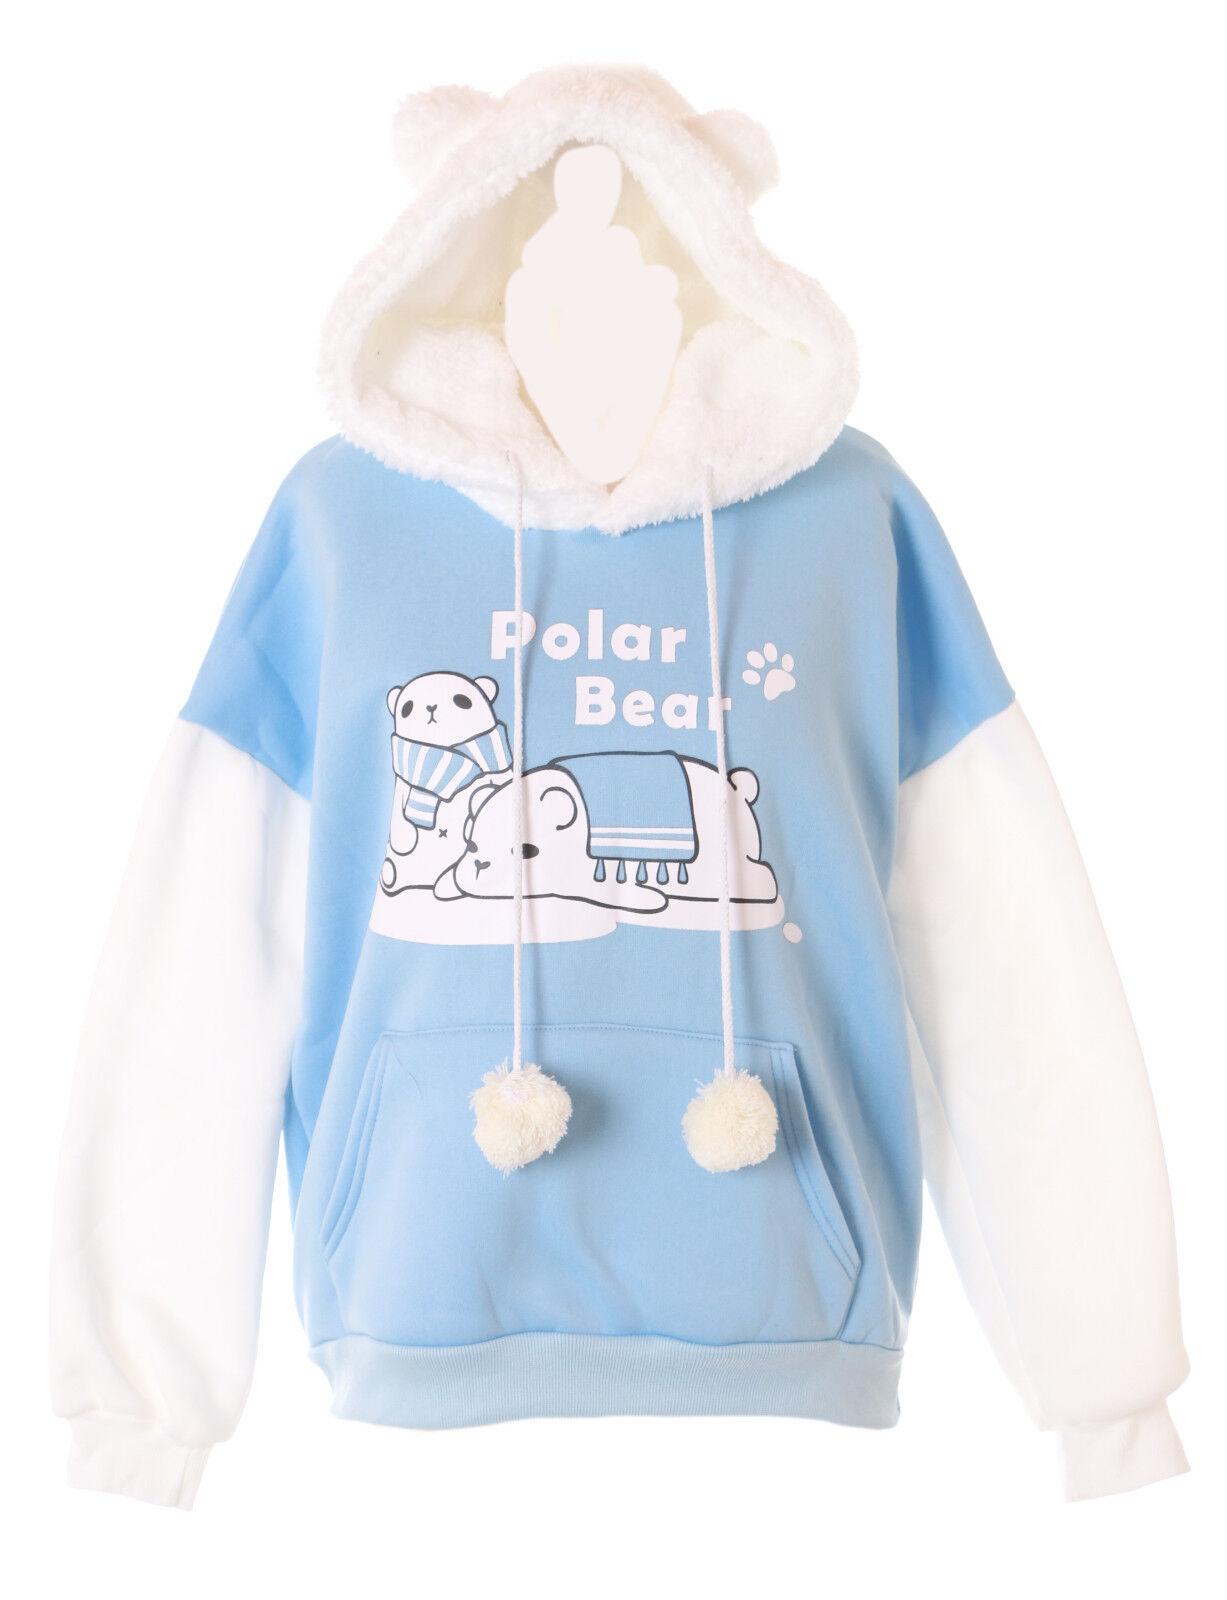 TS-185 Pastel bluee White Polar Bear Pom Poms Goth Lolita Hooded Sweater